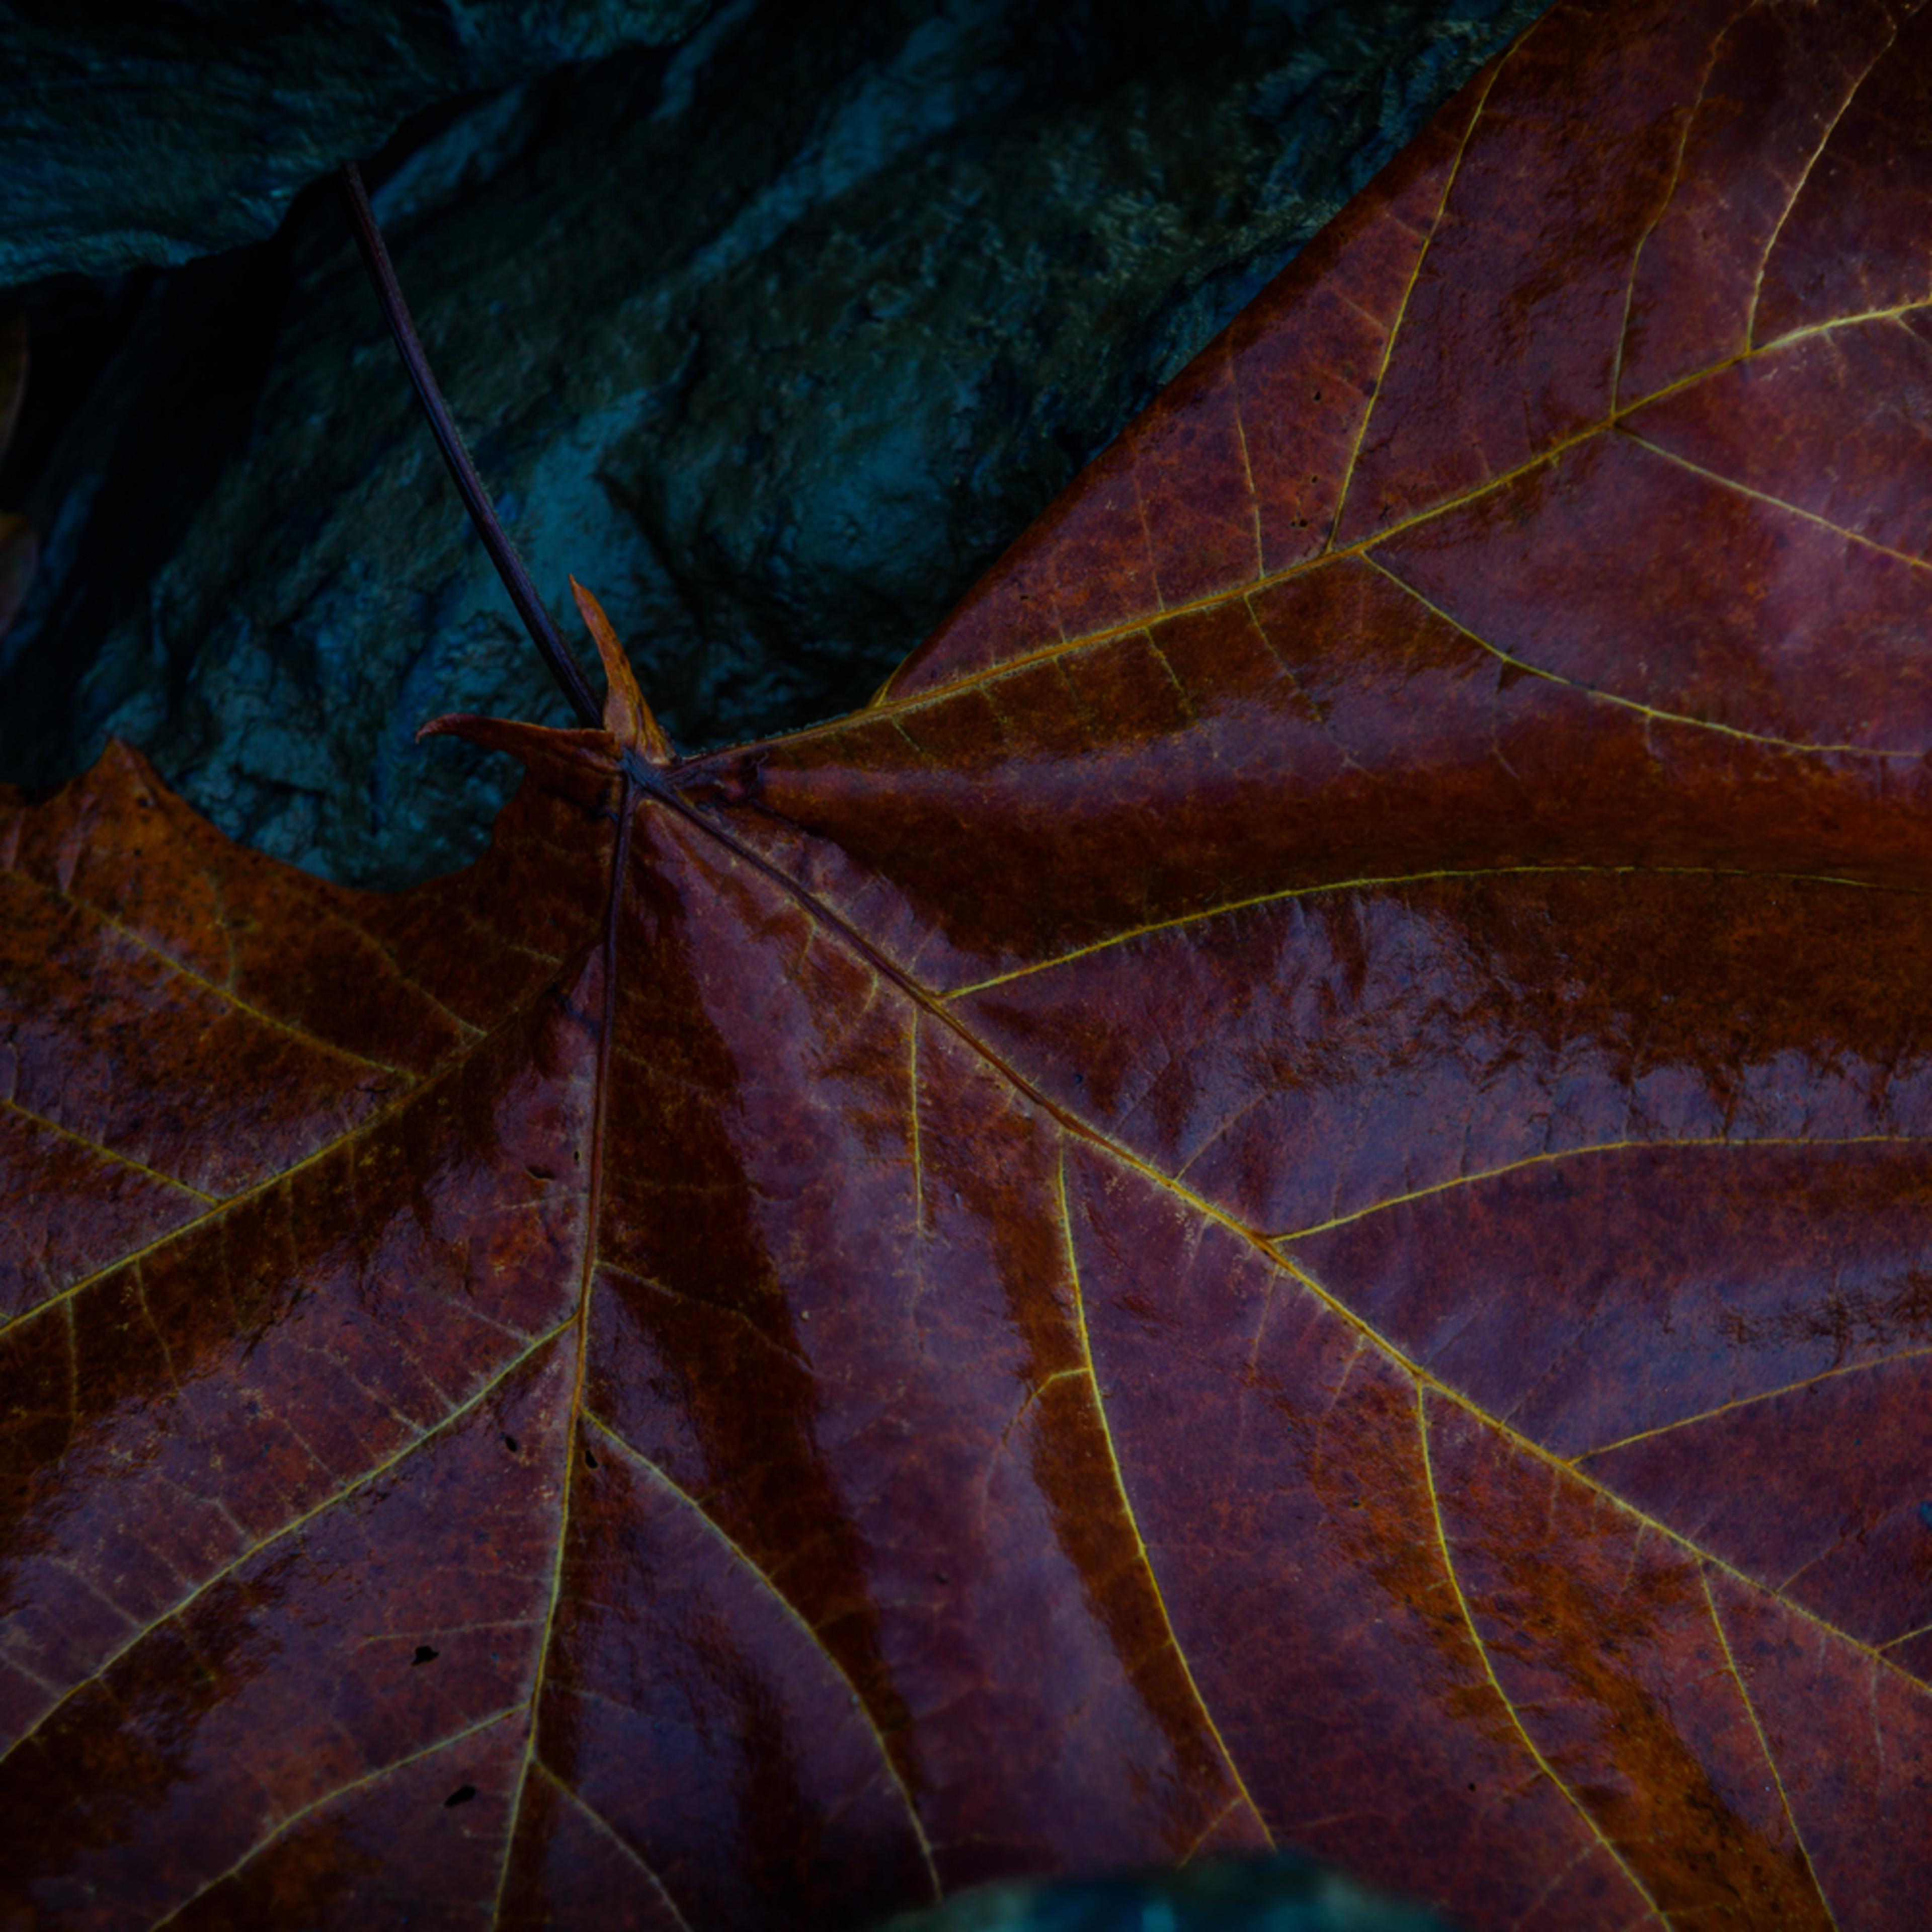 Leaves 2 llnrum